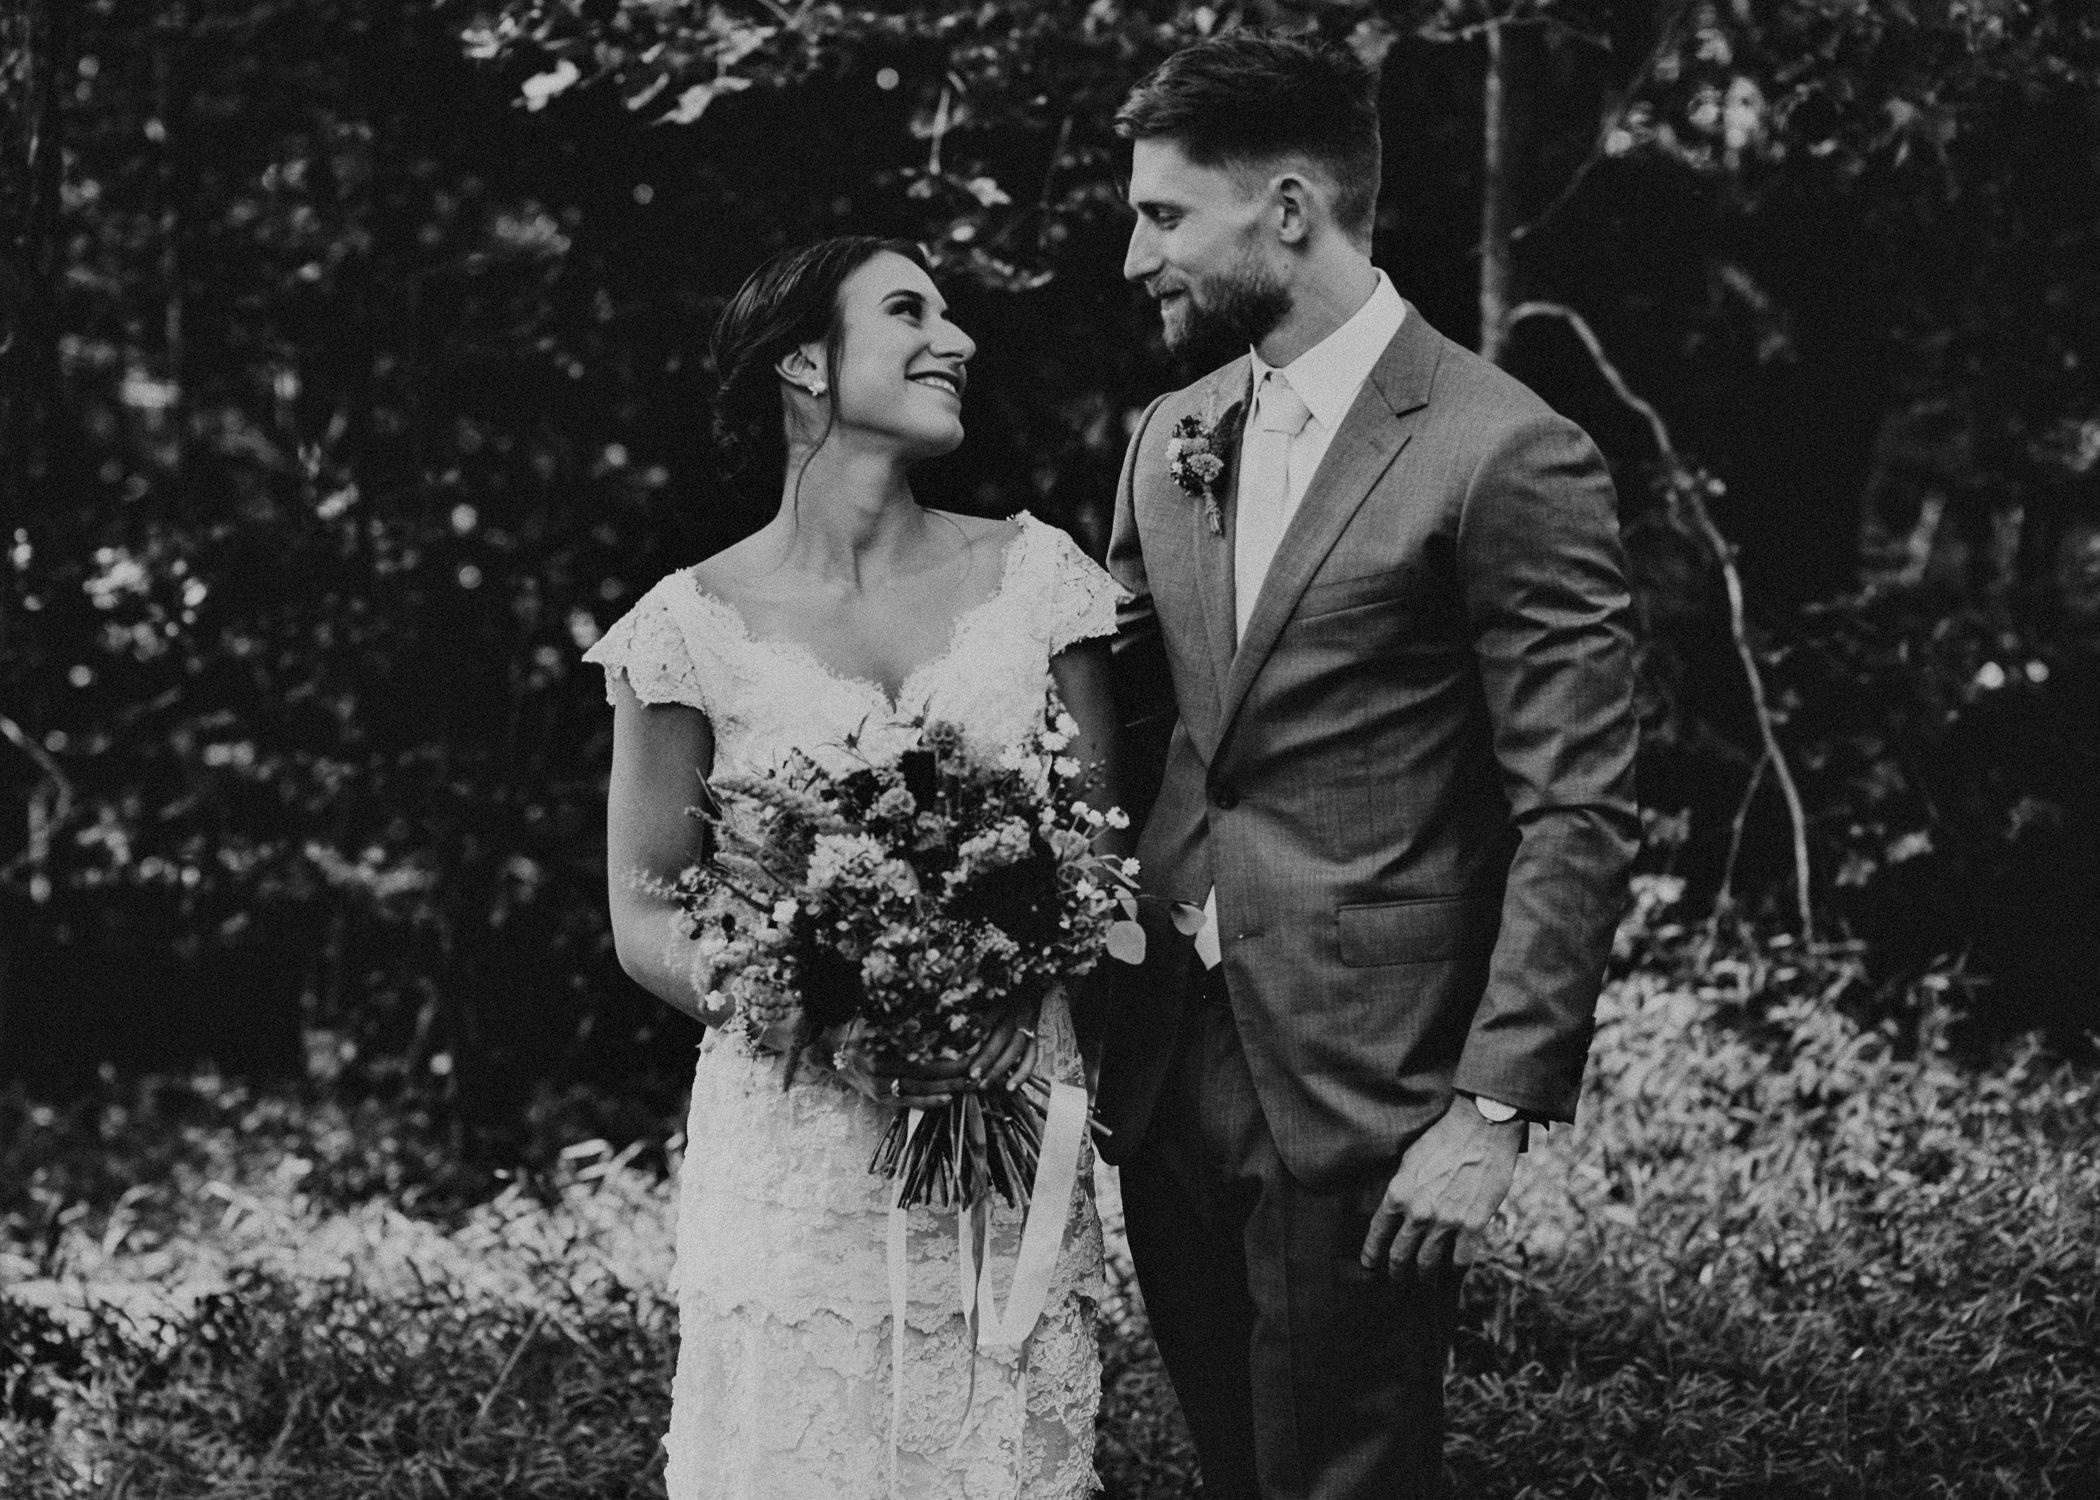 45 Bride & Groom first look before the ceremony on wedding day - Atlanta Wedding Photographer .jpg